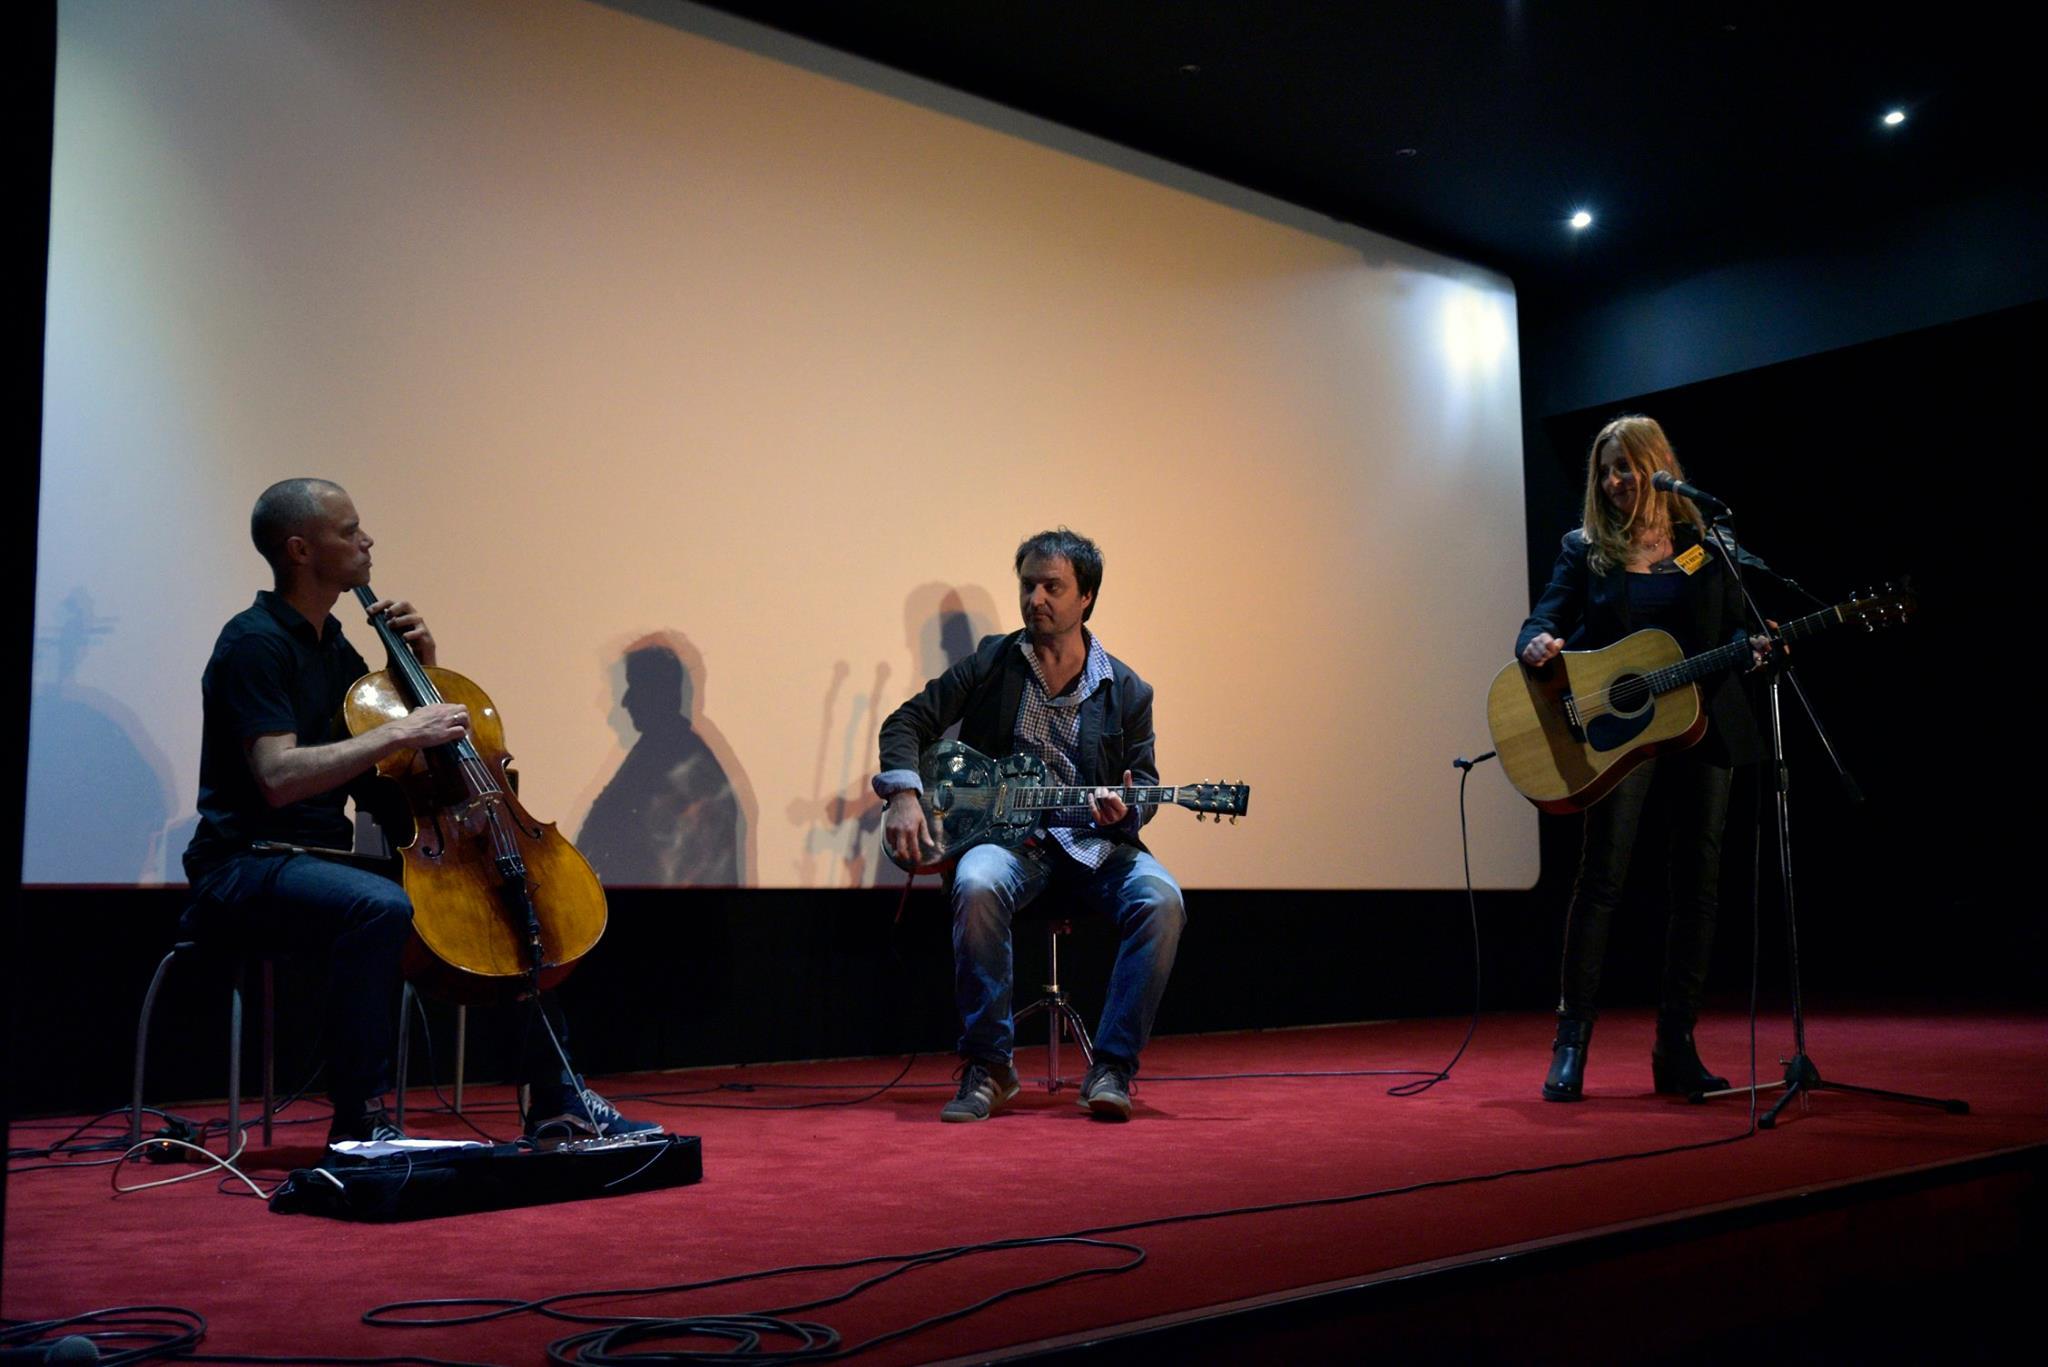 Christine Lidon, Melchior Liboa et Raphaël Sweifel